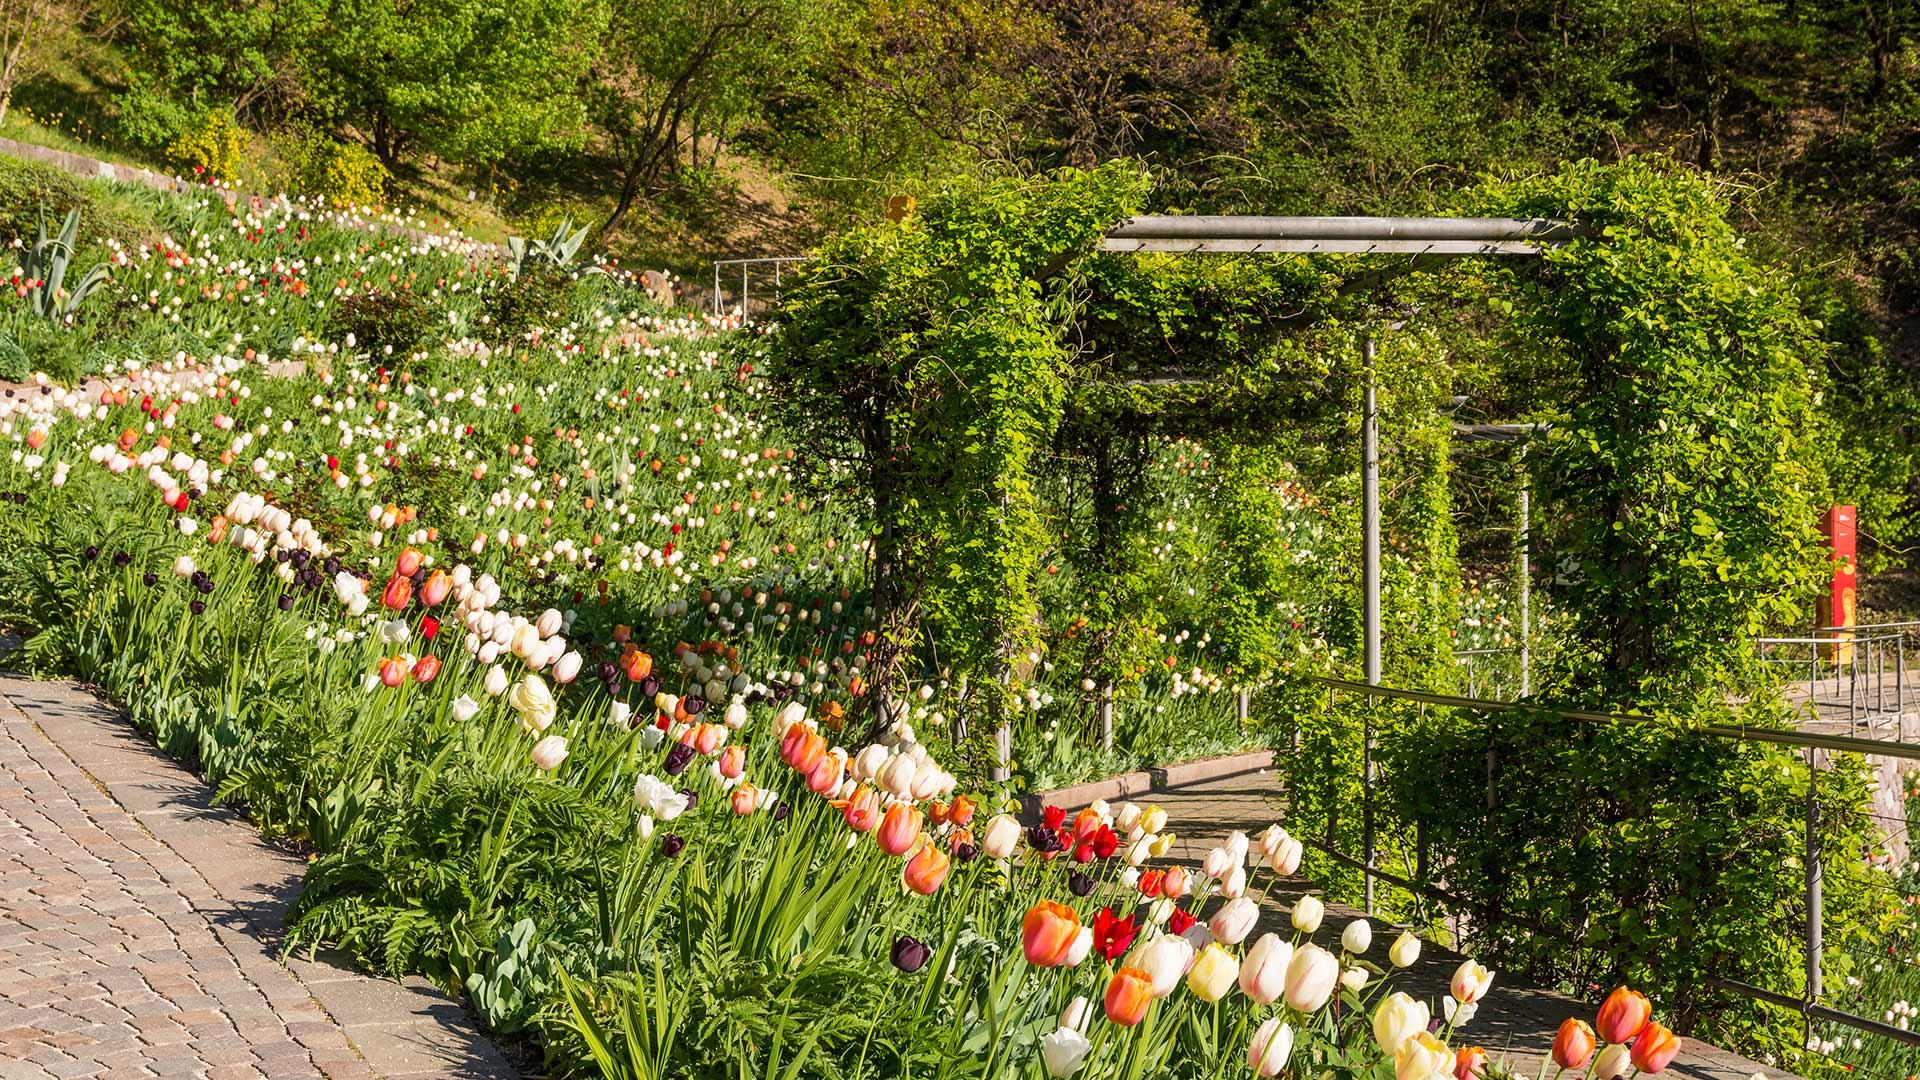 Primavera - Castel Trauttmansdorff